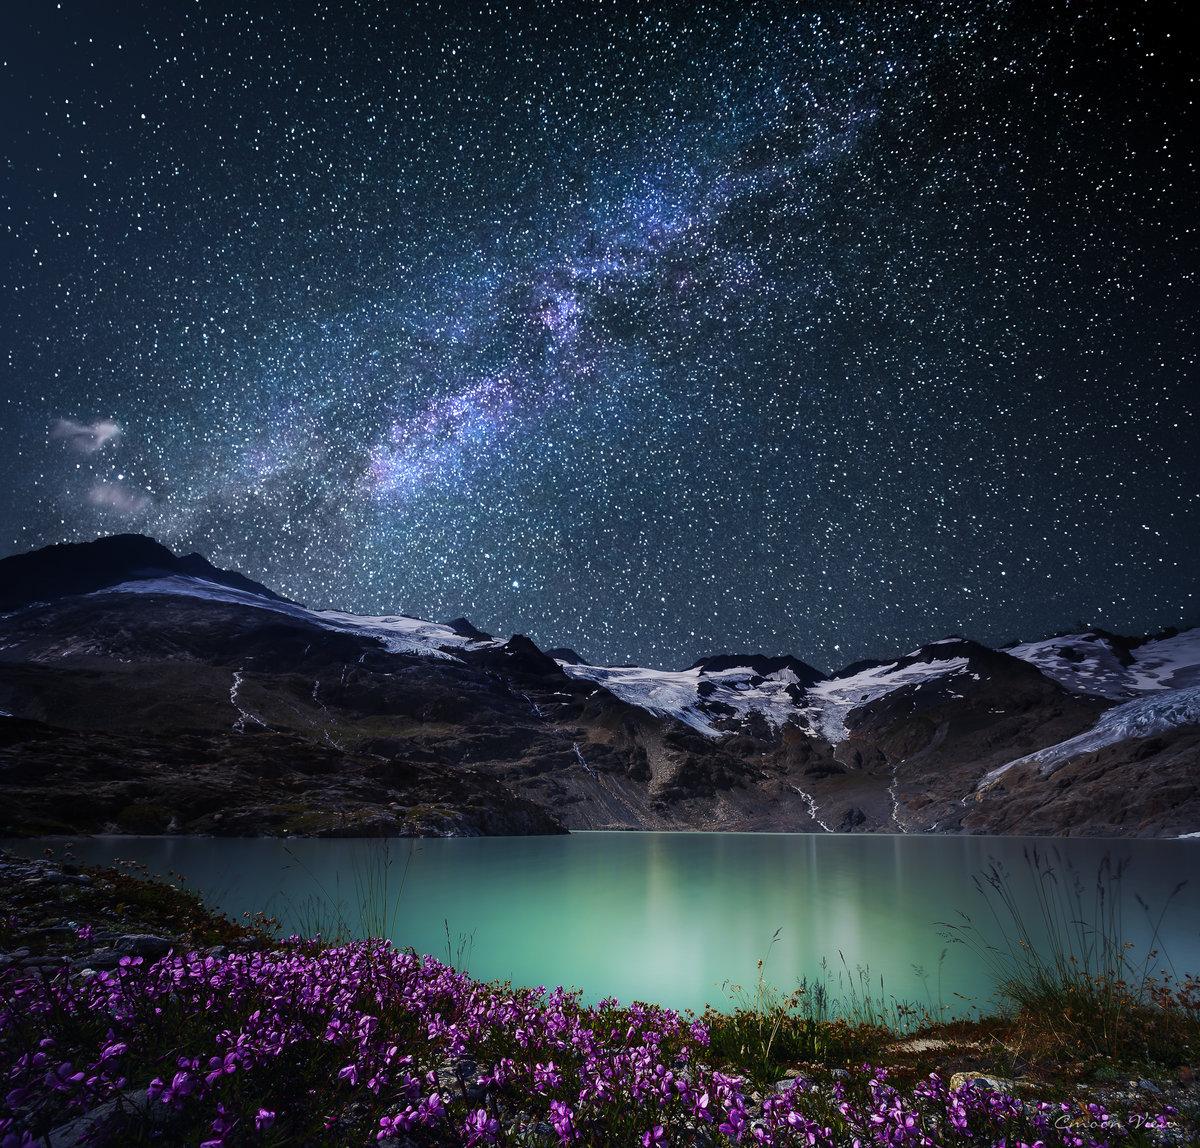 таджикистане самое красивое звездное небо фото поверила, отправила